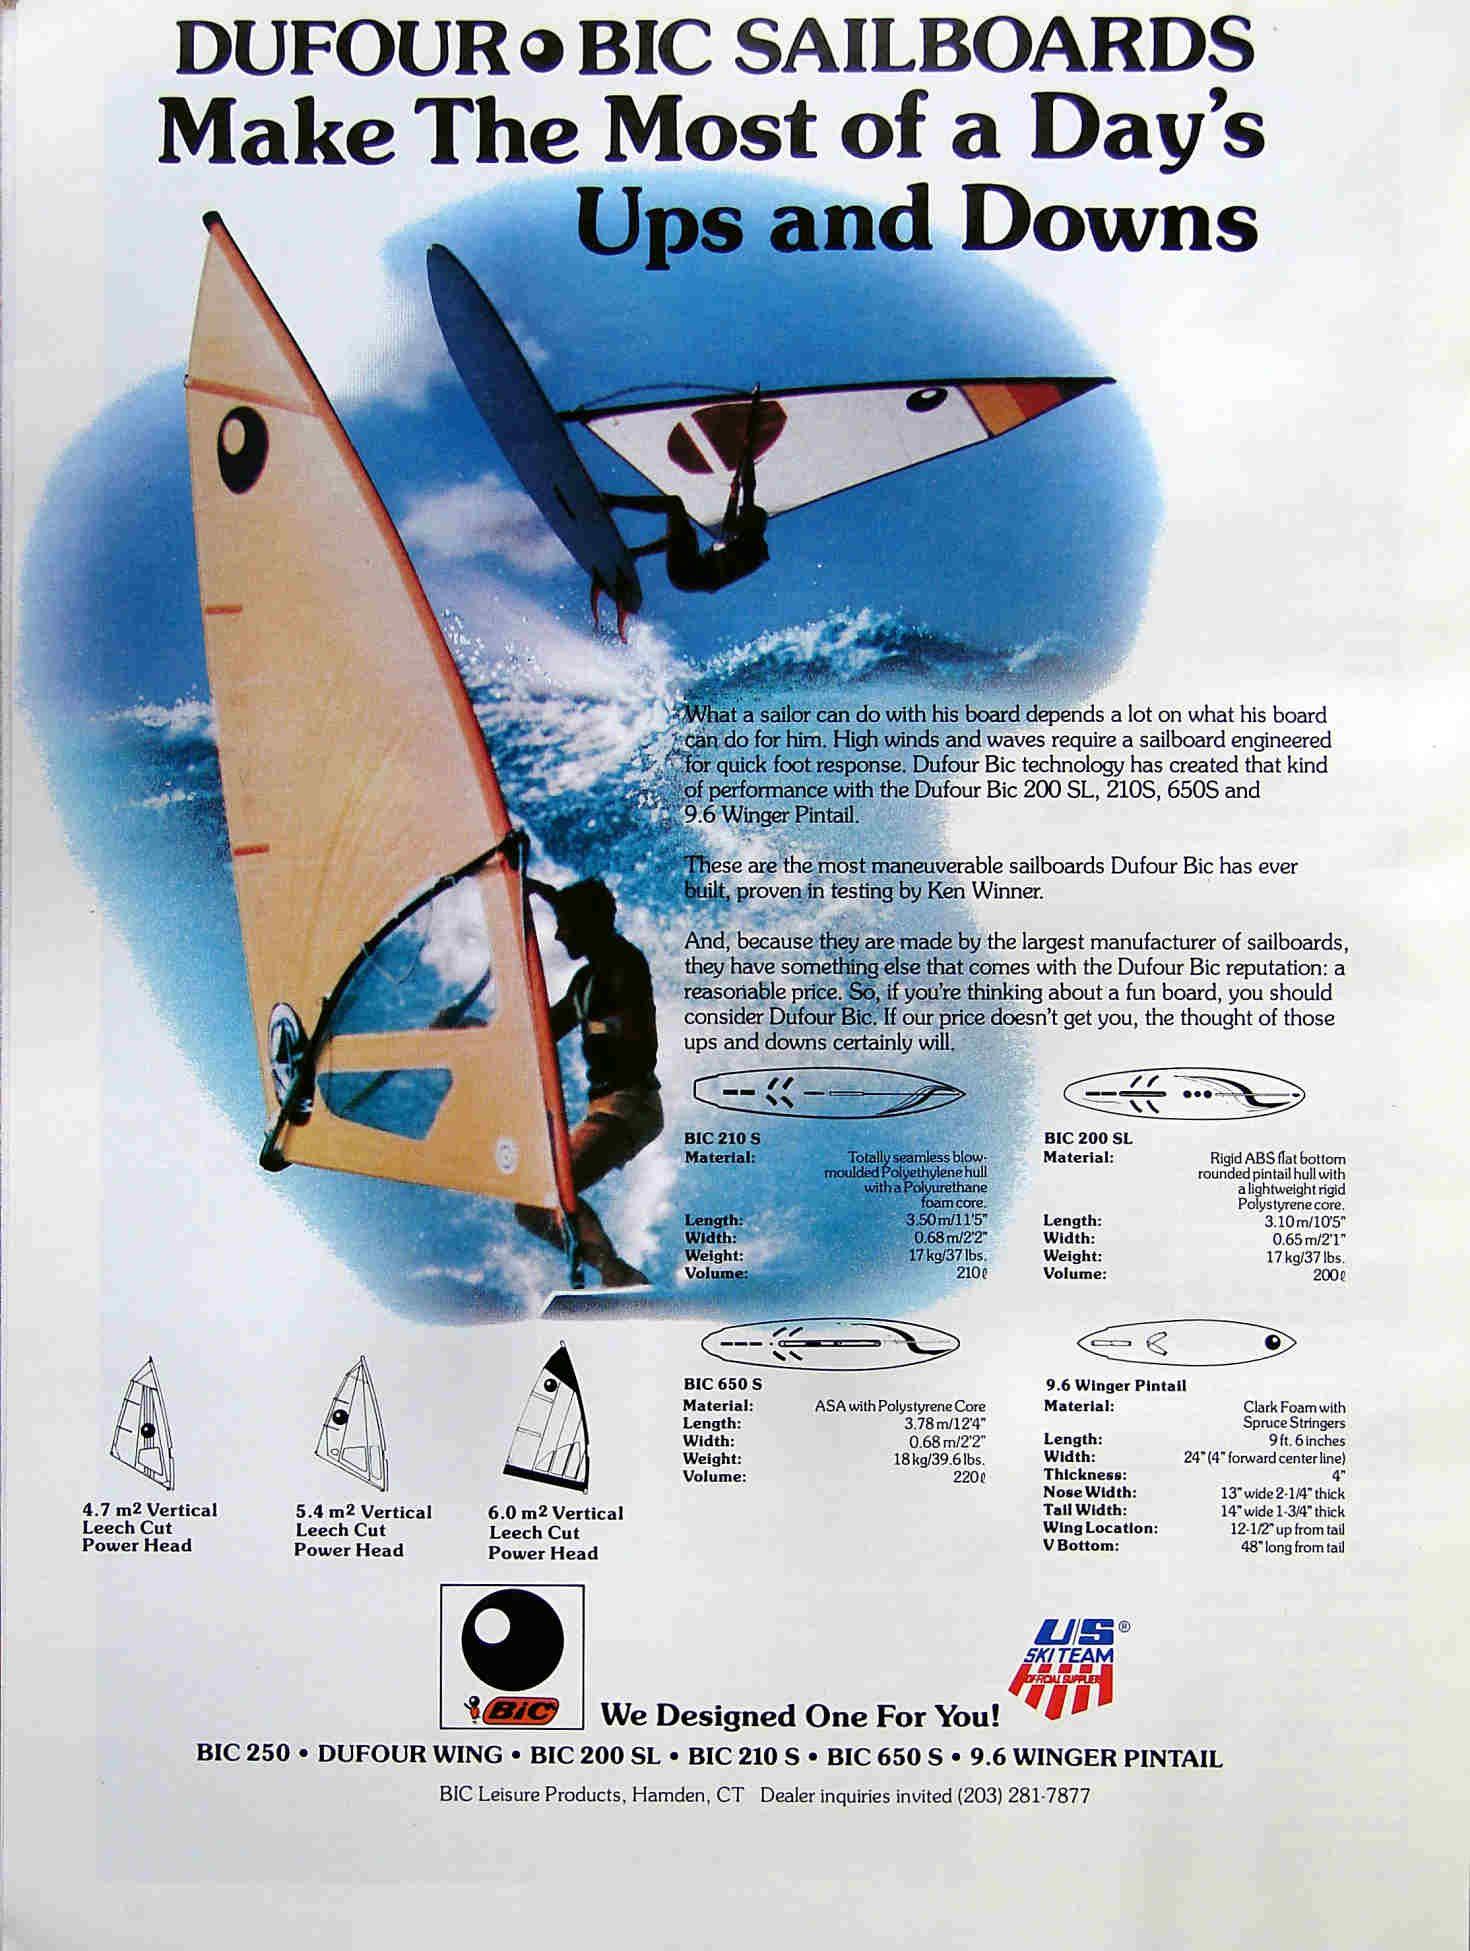 Windsurfing Brochures Ads 80 S Early 2000 S F2 Fanatic Hi Fly Aquata Bic Magnum Tornado Windspeed Part1 Windsurfing Surfing Kite Surfing